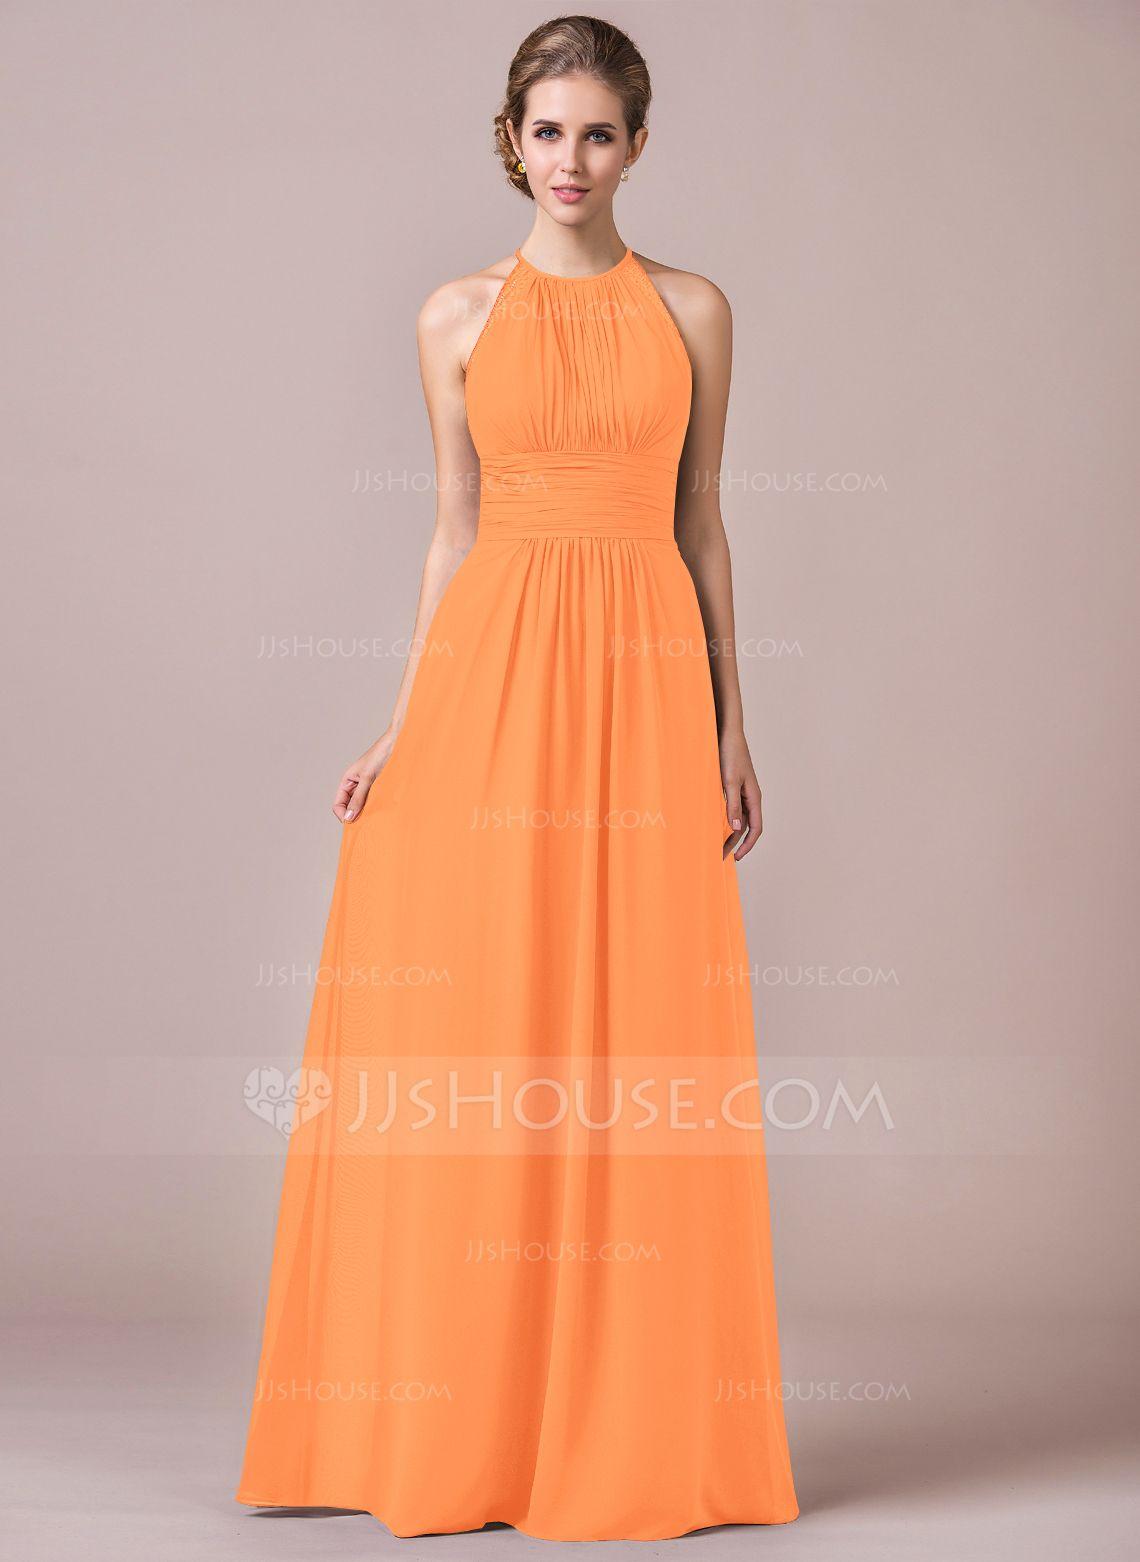 Alineprincess halter floorlength chiffon bridesmaid dress with